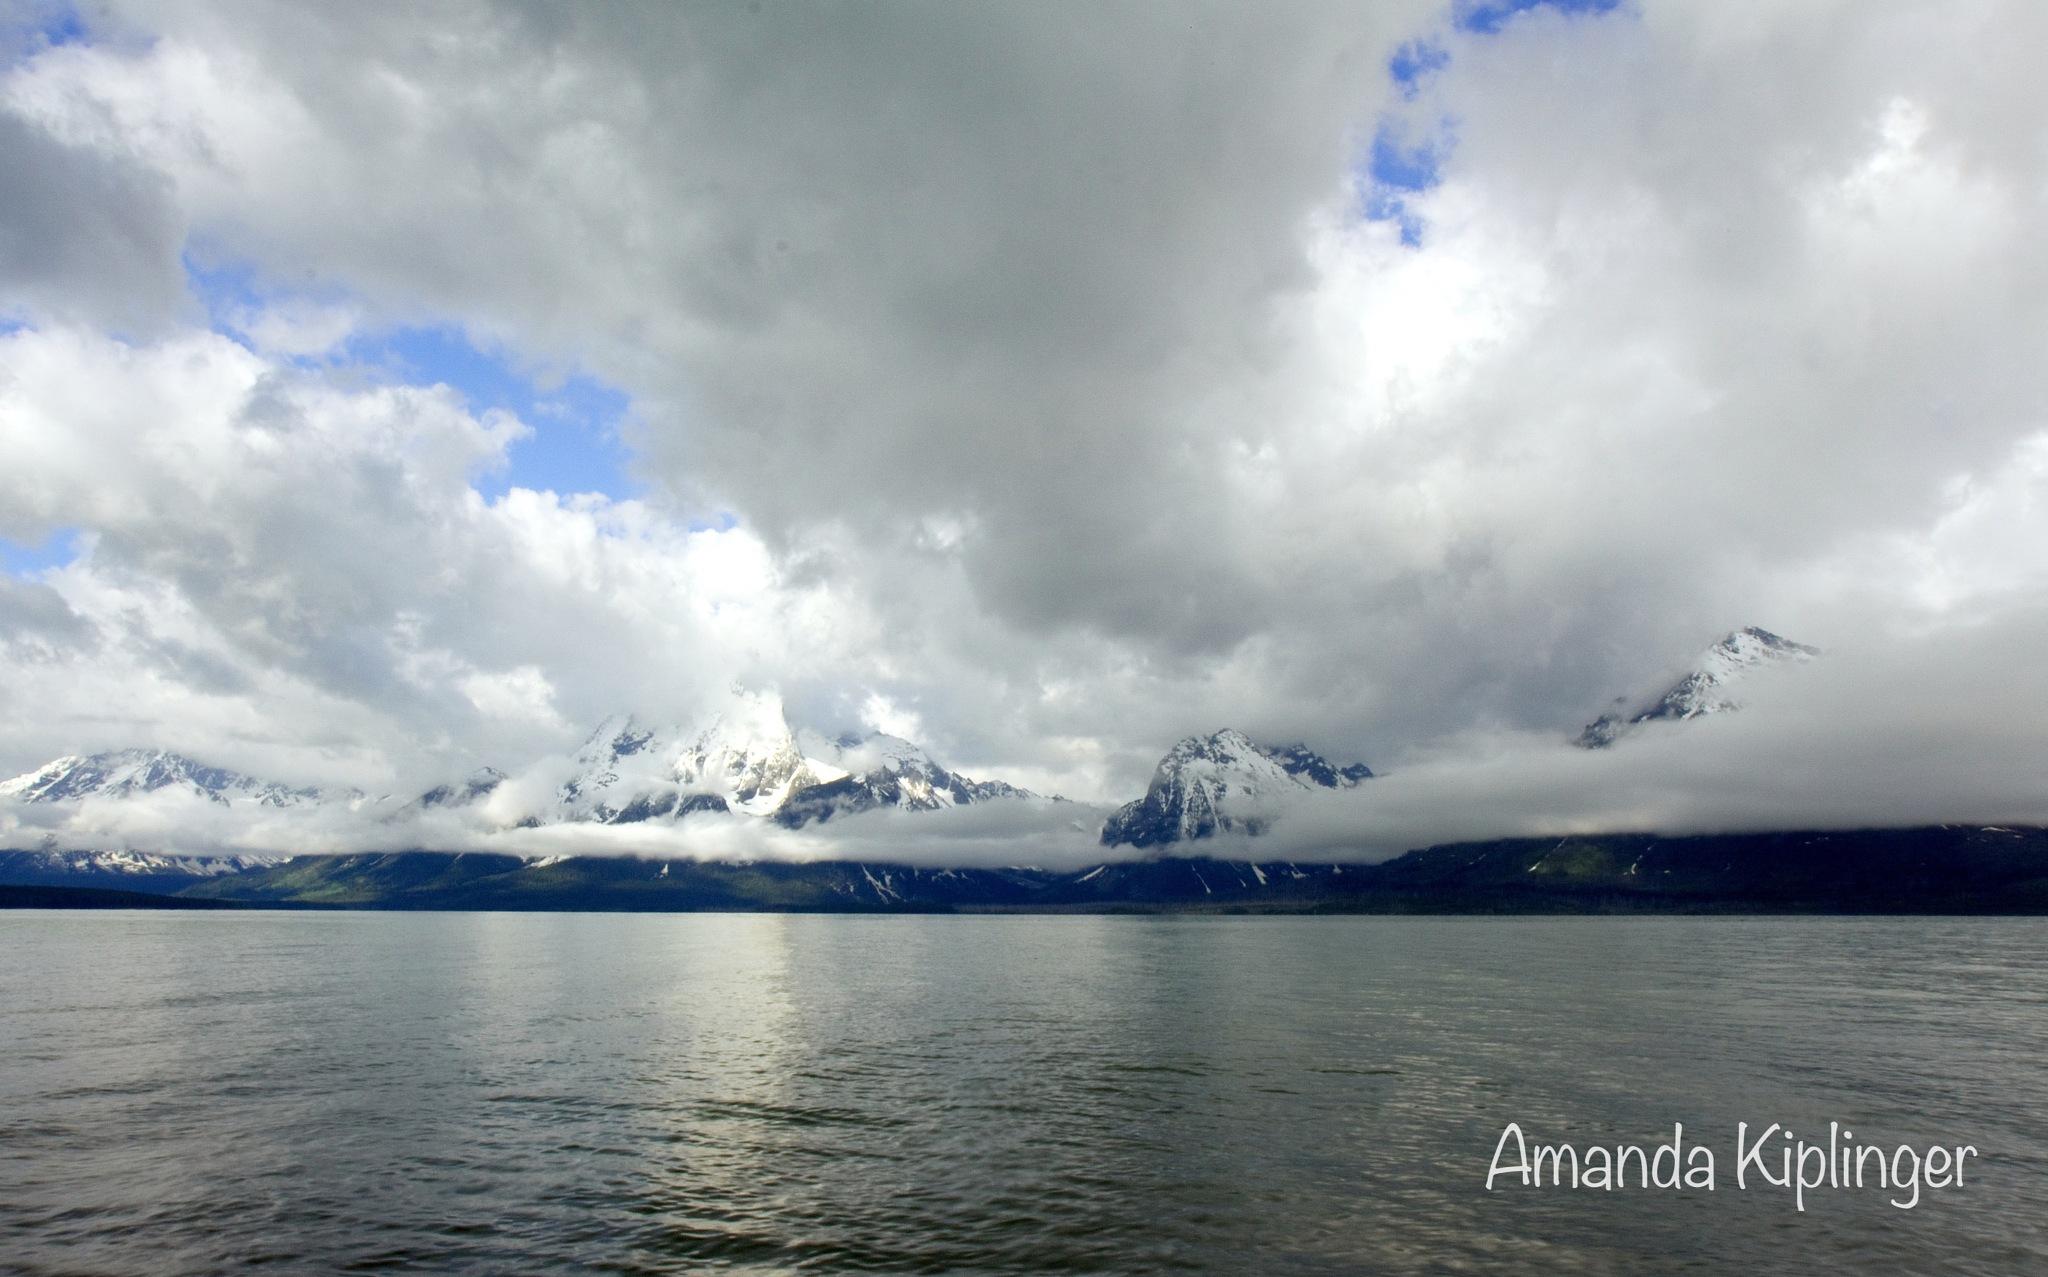 The Clouds Above by Amanda Kiplinger